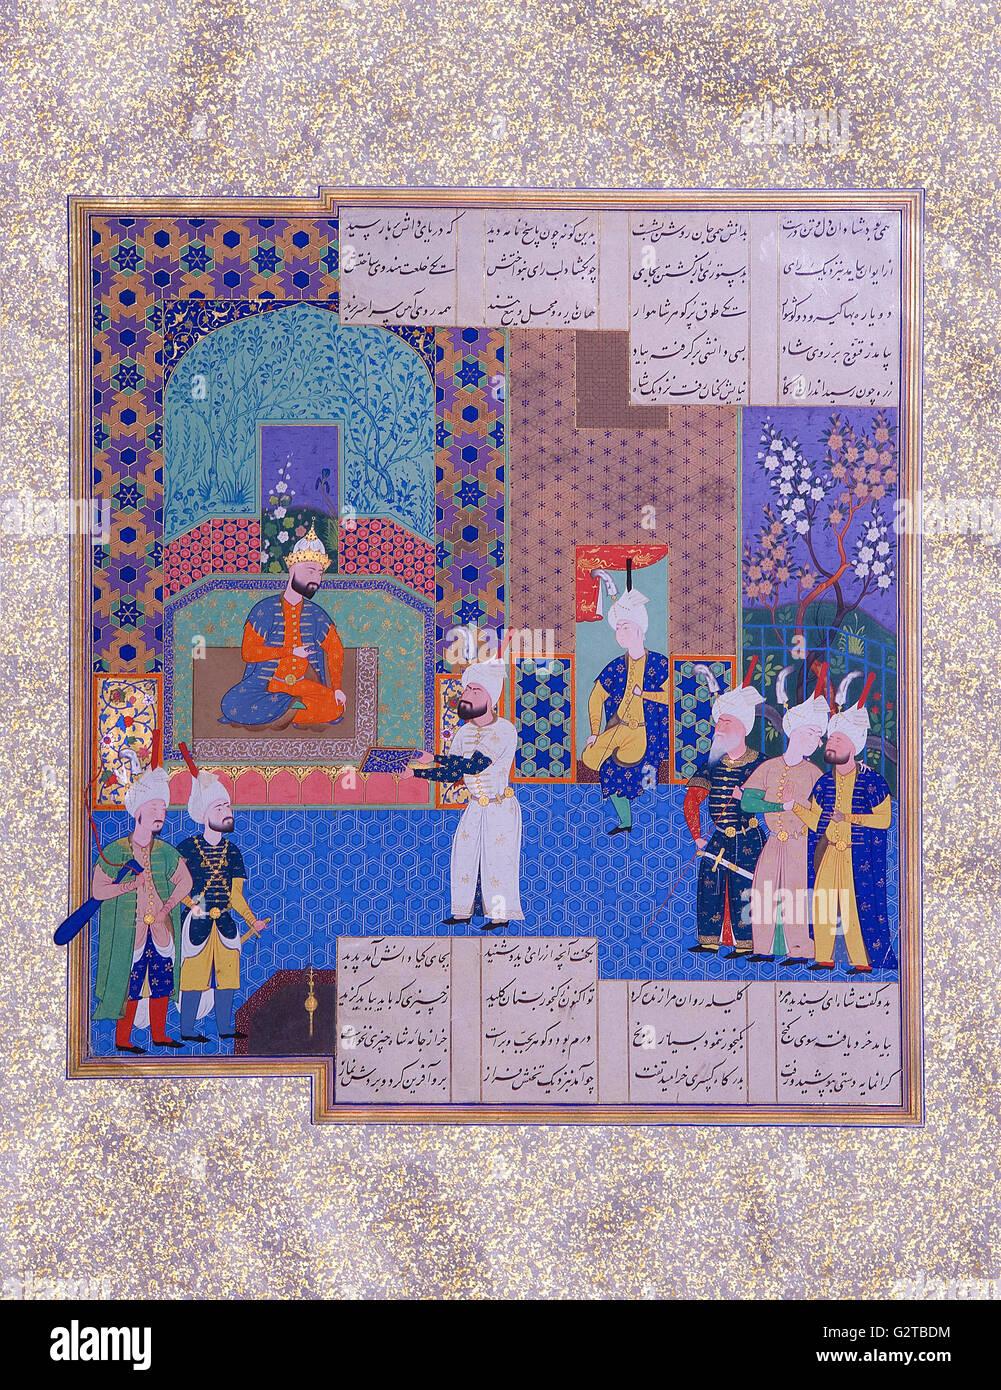 Inconnu, l'Iran, 16e siècle - Illustration - Photo Stock